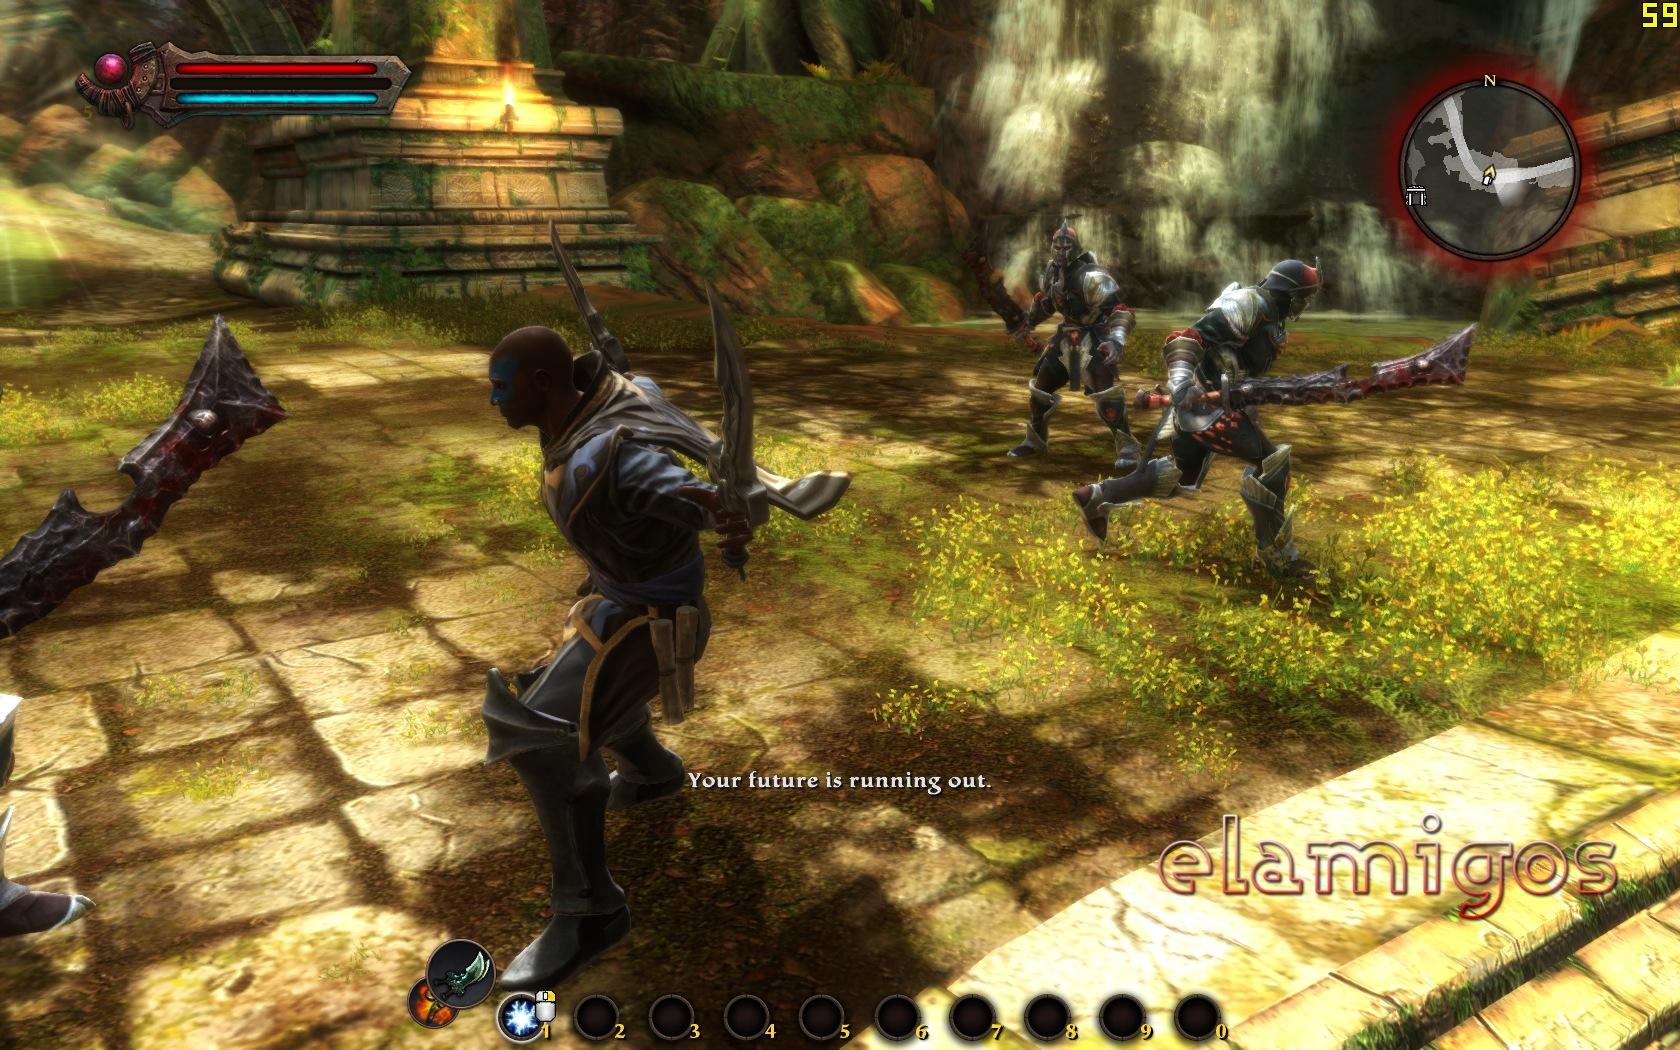 Kingdoms of Amalur Reckoning - Legend of Dead Kel DLC (by Skidrow.